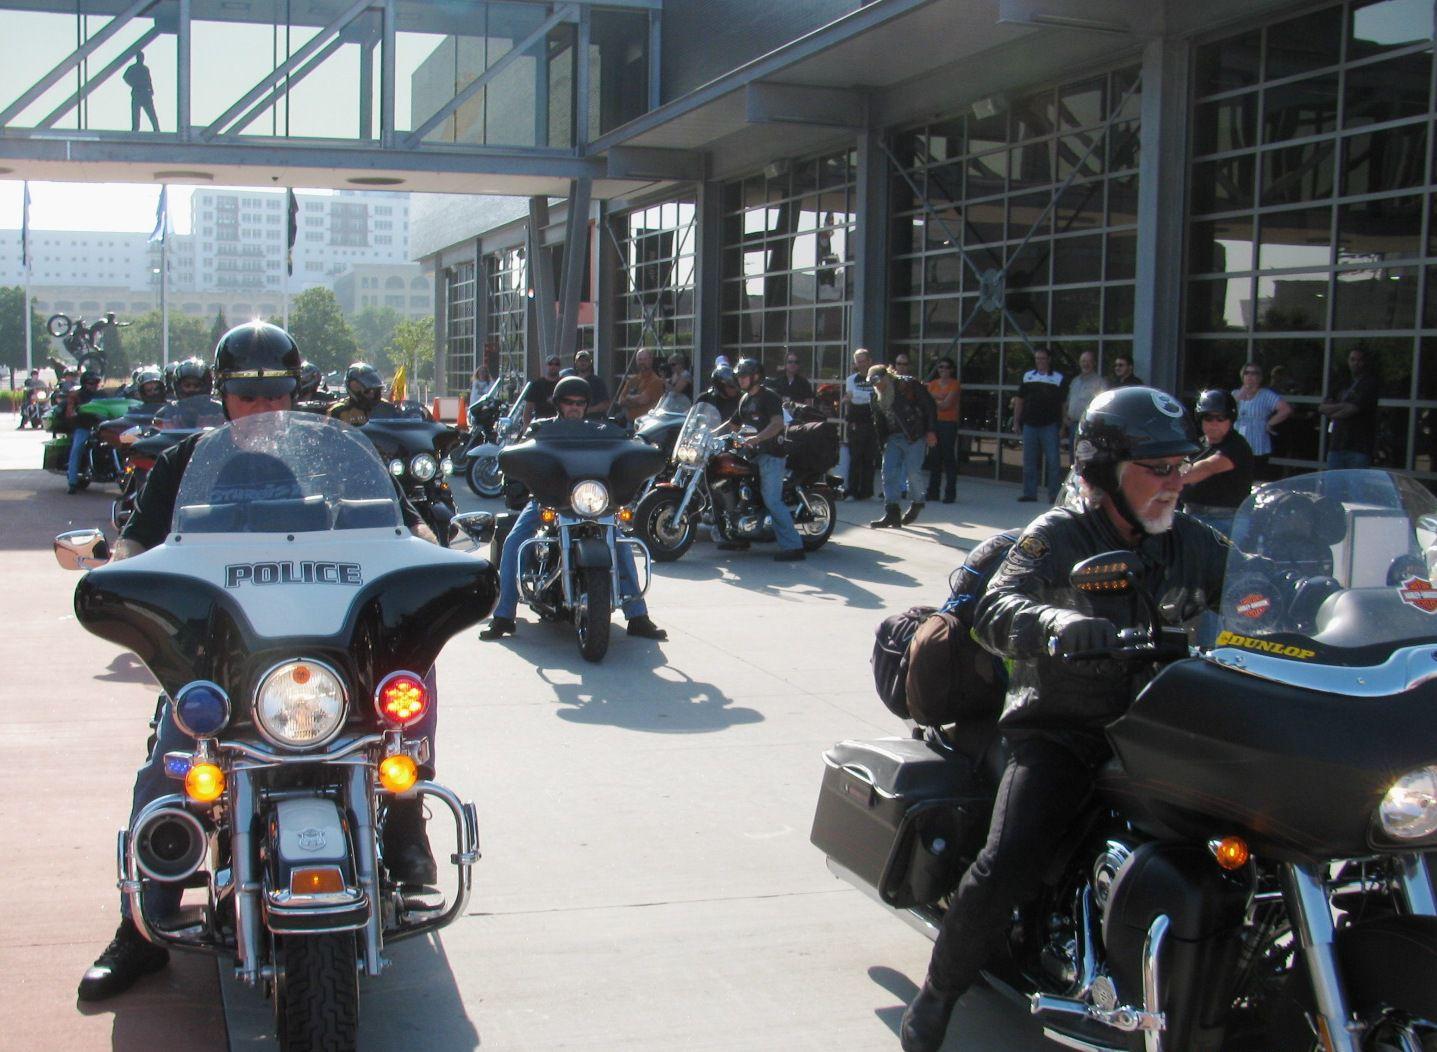 Bill Davidson prepares to lead riders to Sturgis